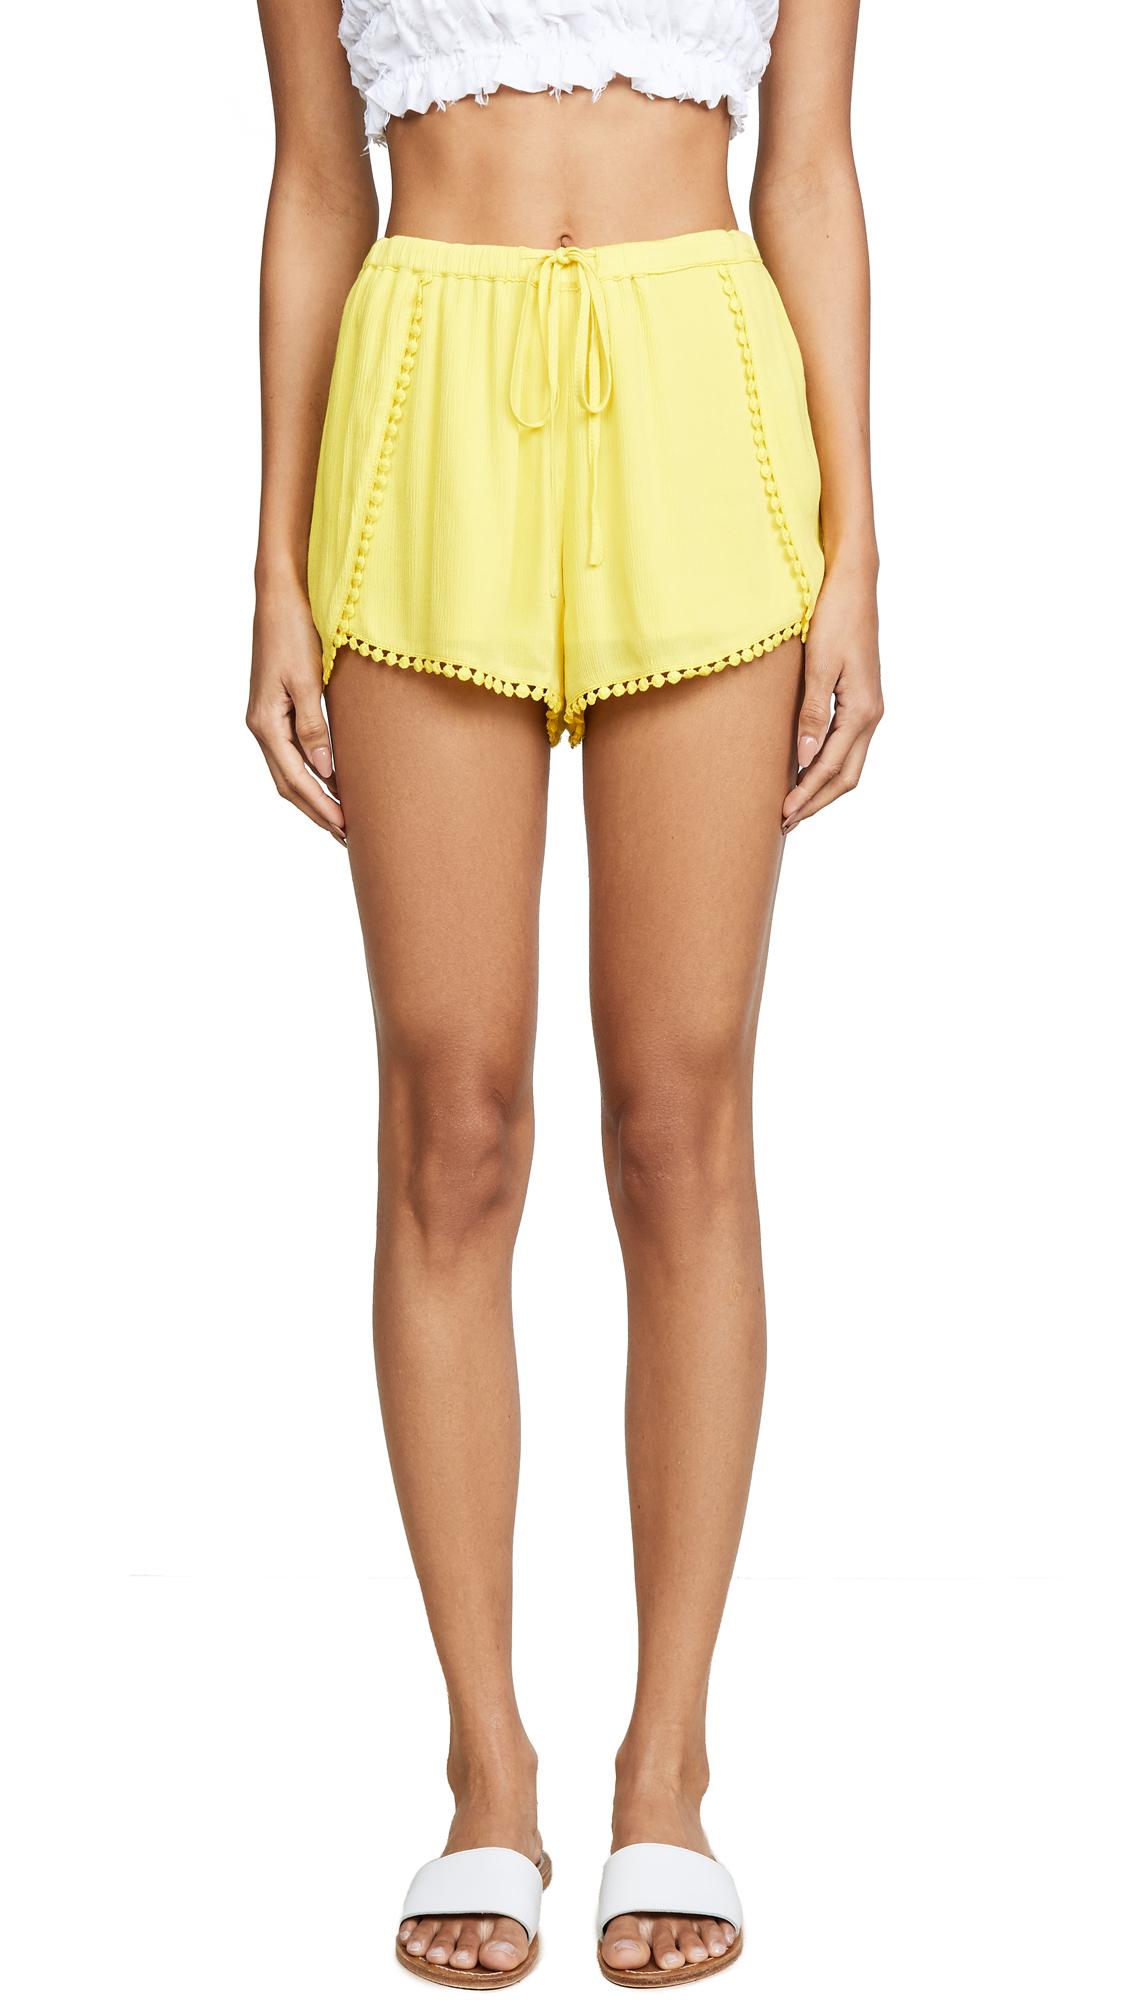 BB Dakota Jack by BB Dakota Caroline Shorts - Lemon Yellow